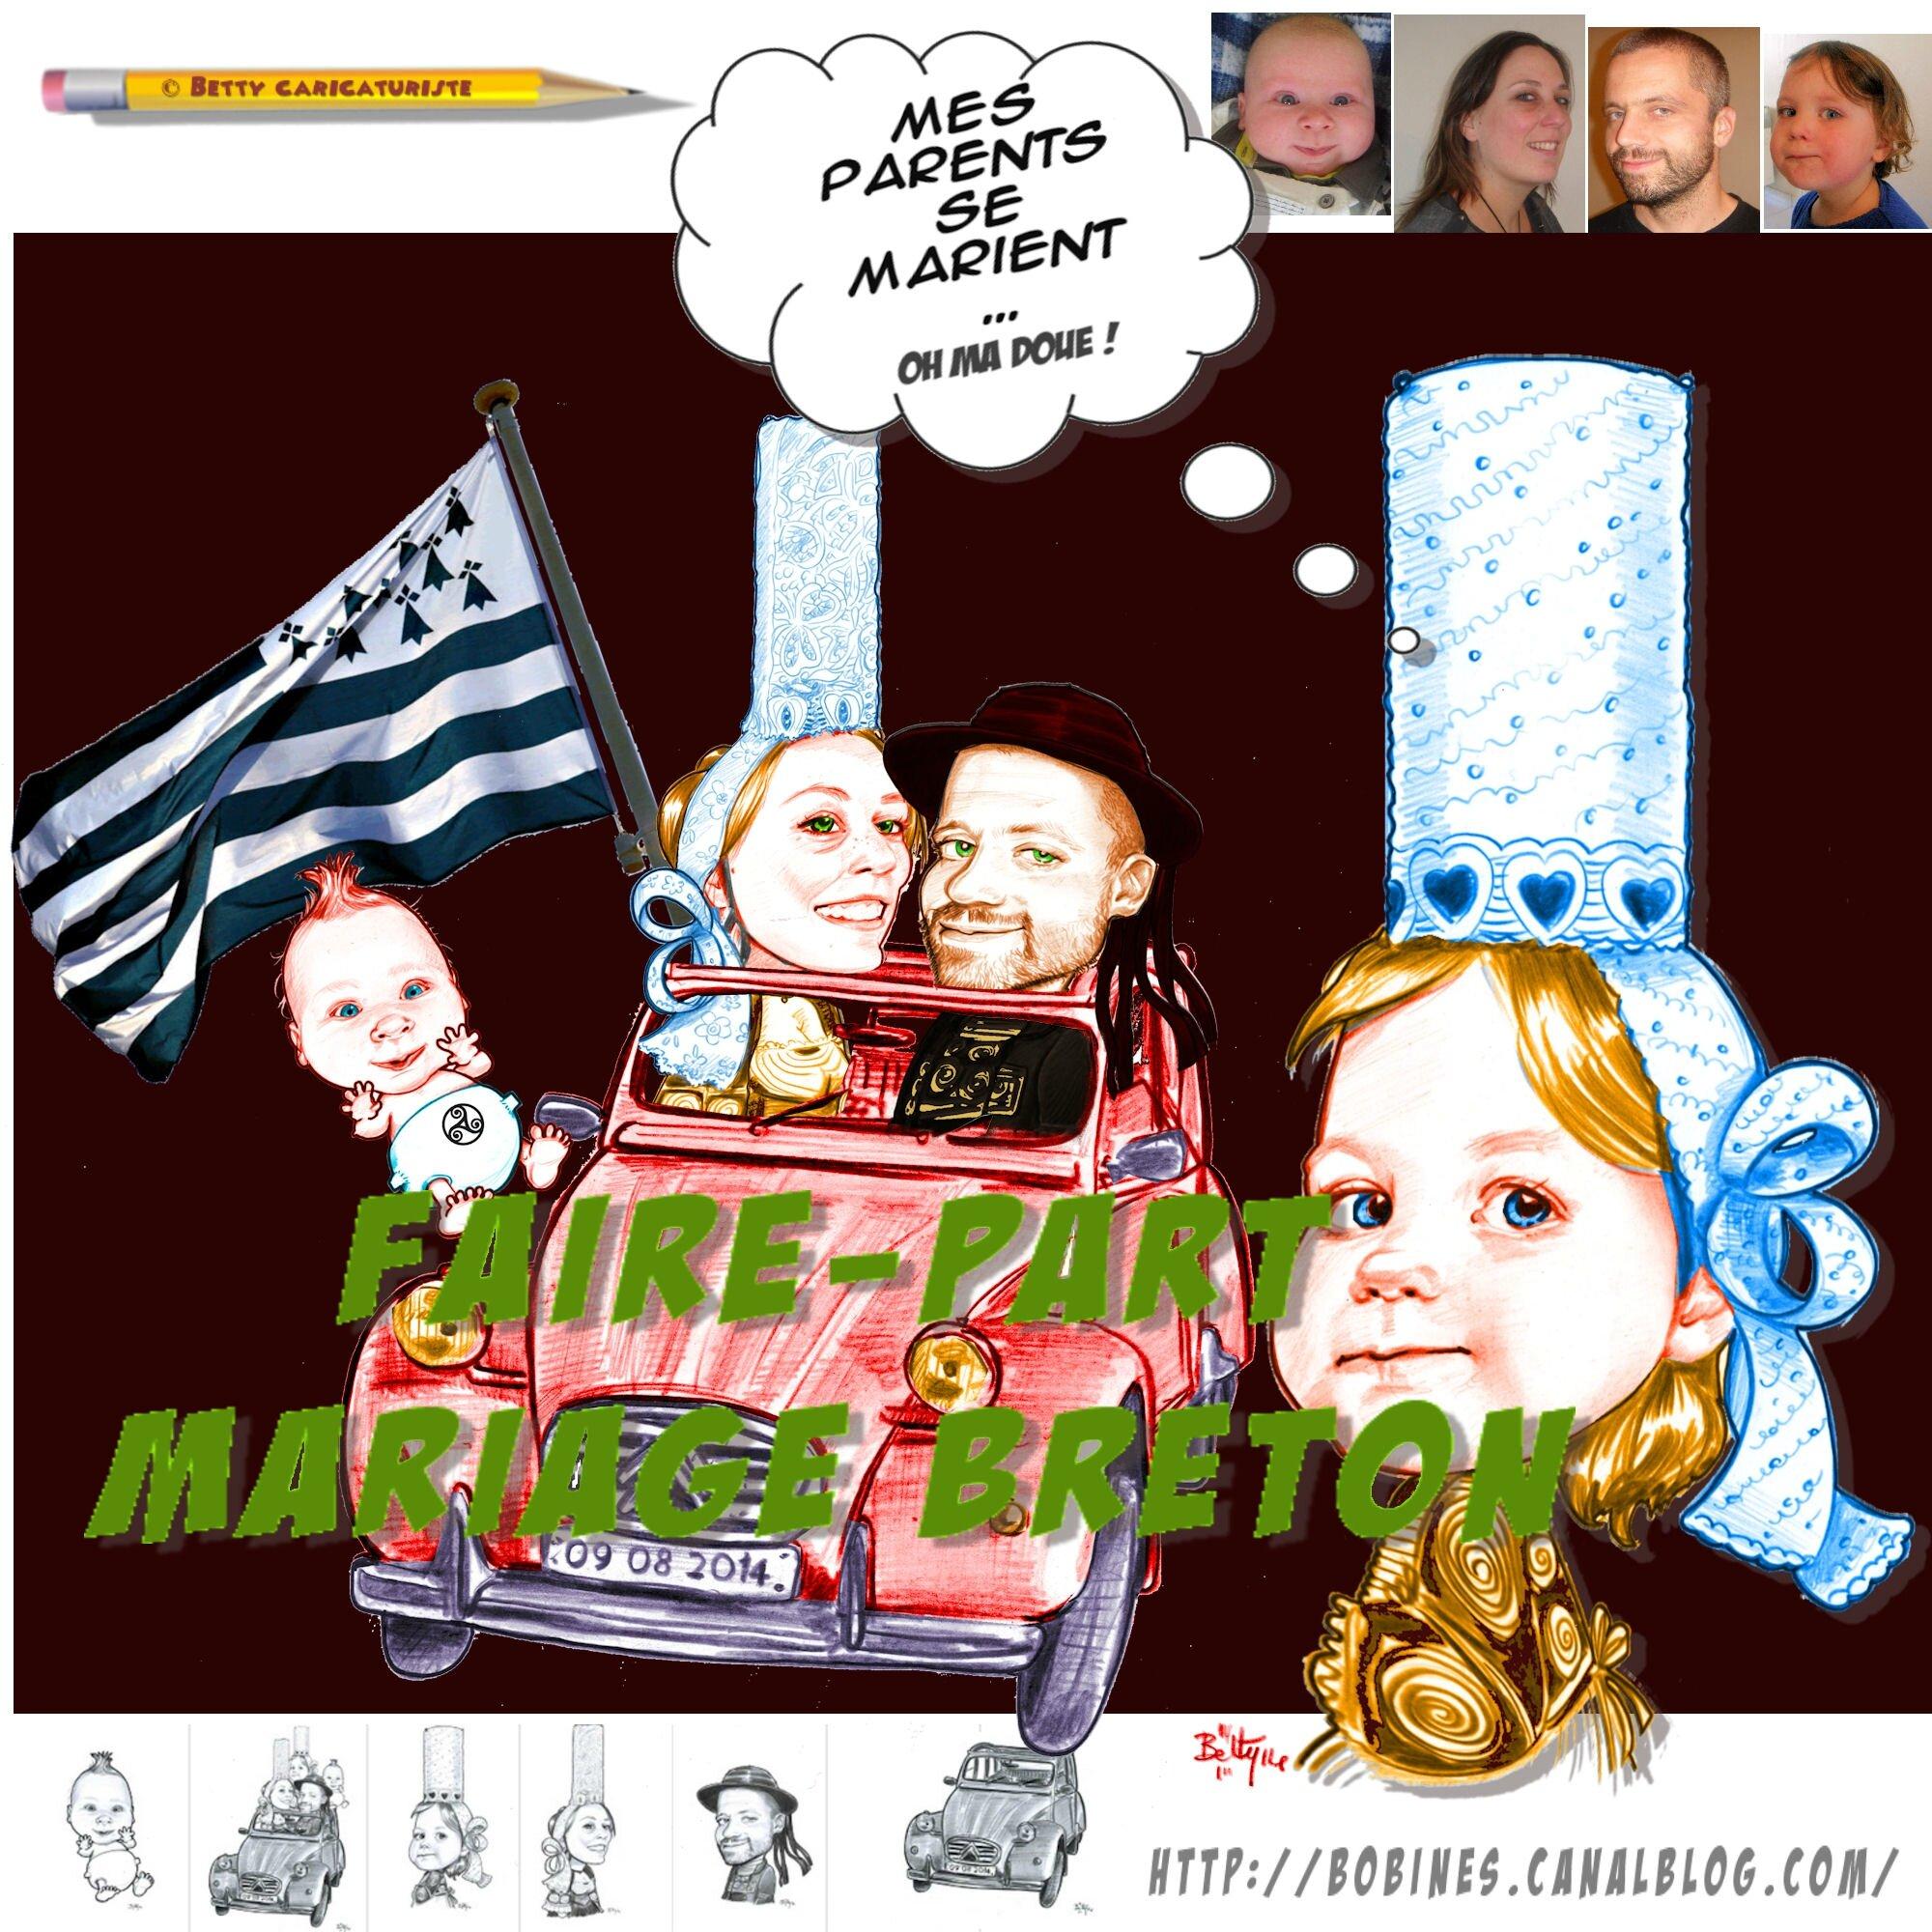 faire part mariage breton 2ch bigouden humour caricatures caricaturiste betty caricatures. Black Bedroom Furniture Sets. Home Design Ideas